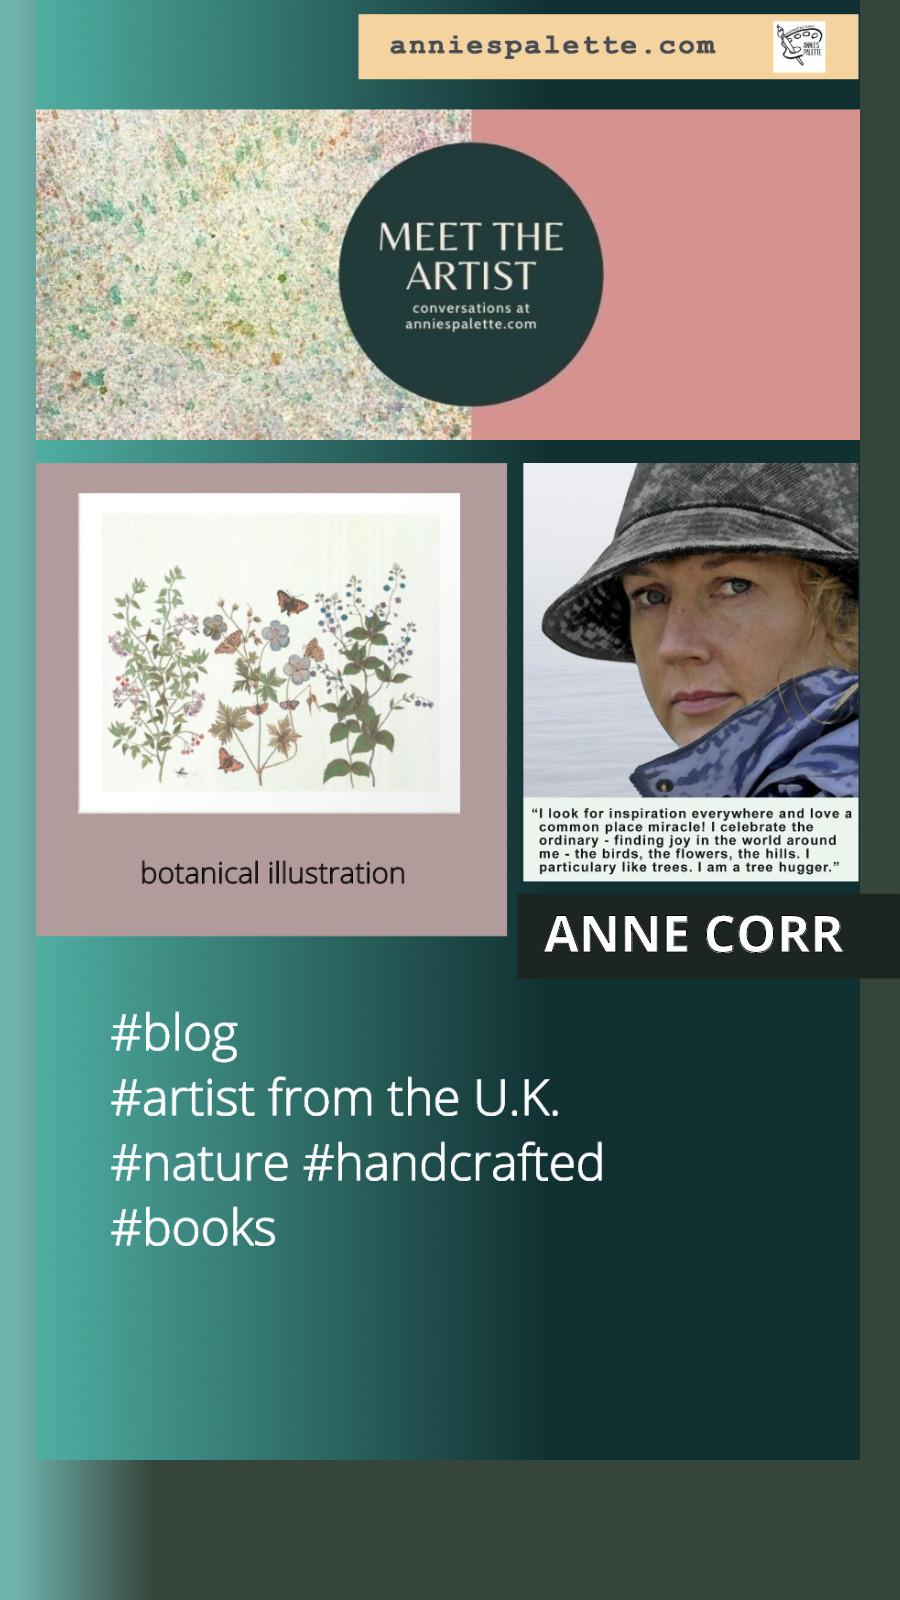 United Kingdom artist Anne Corr